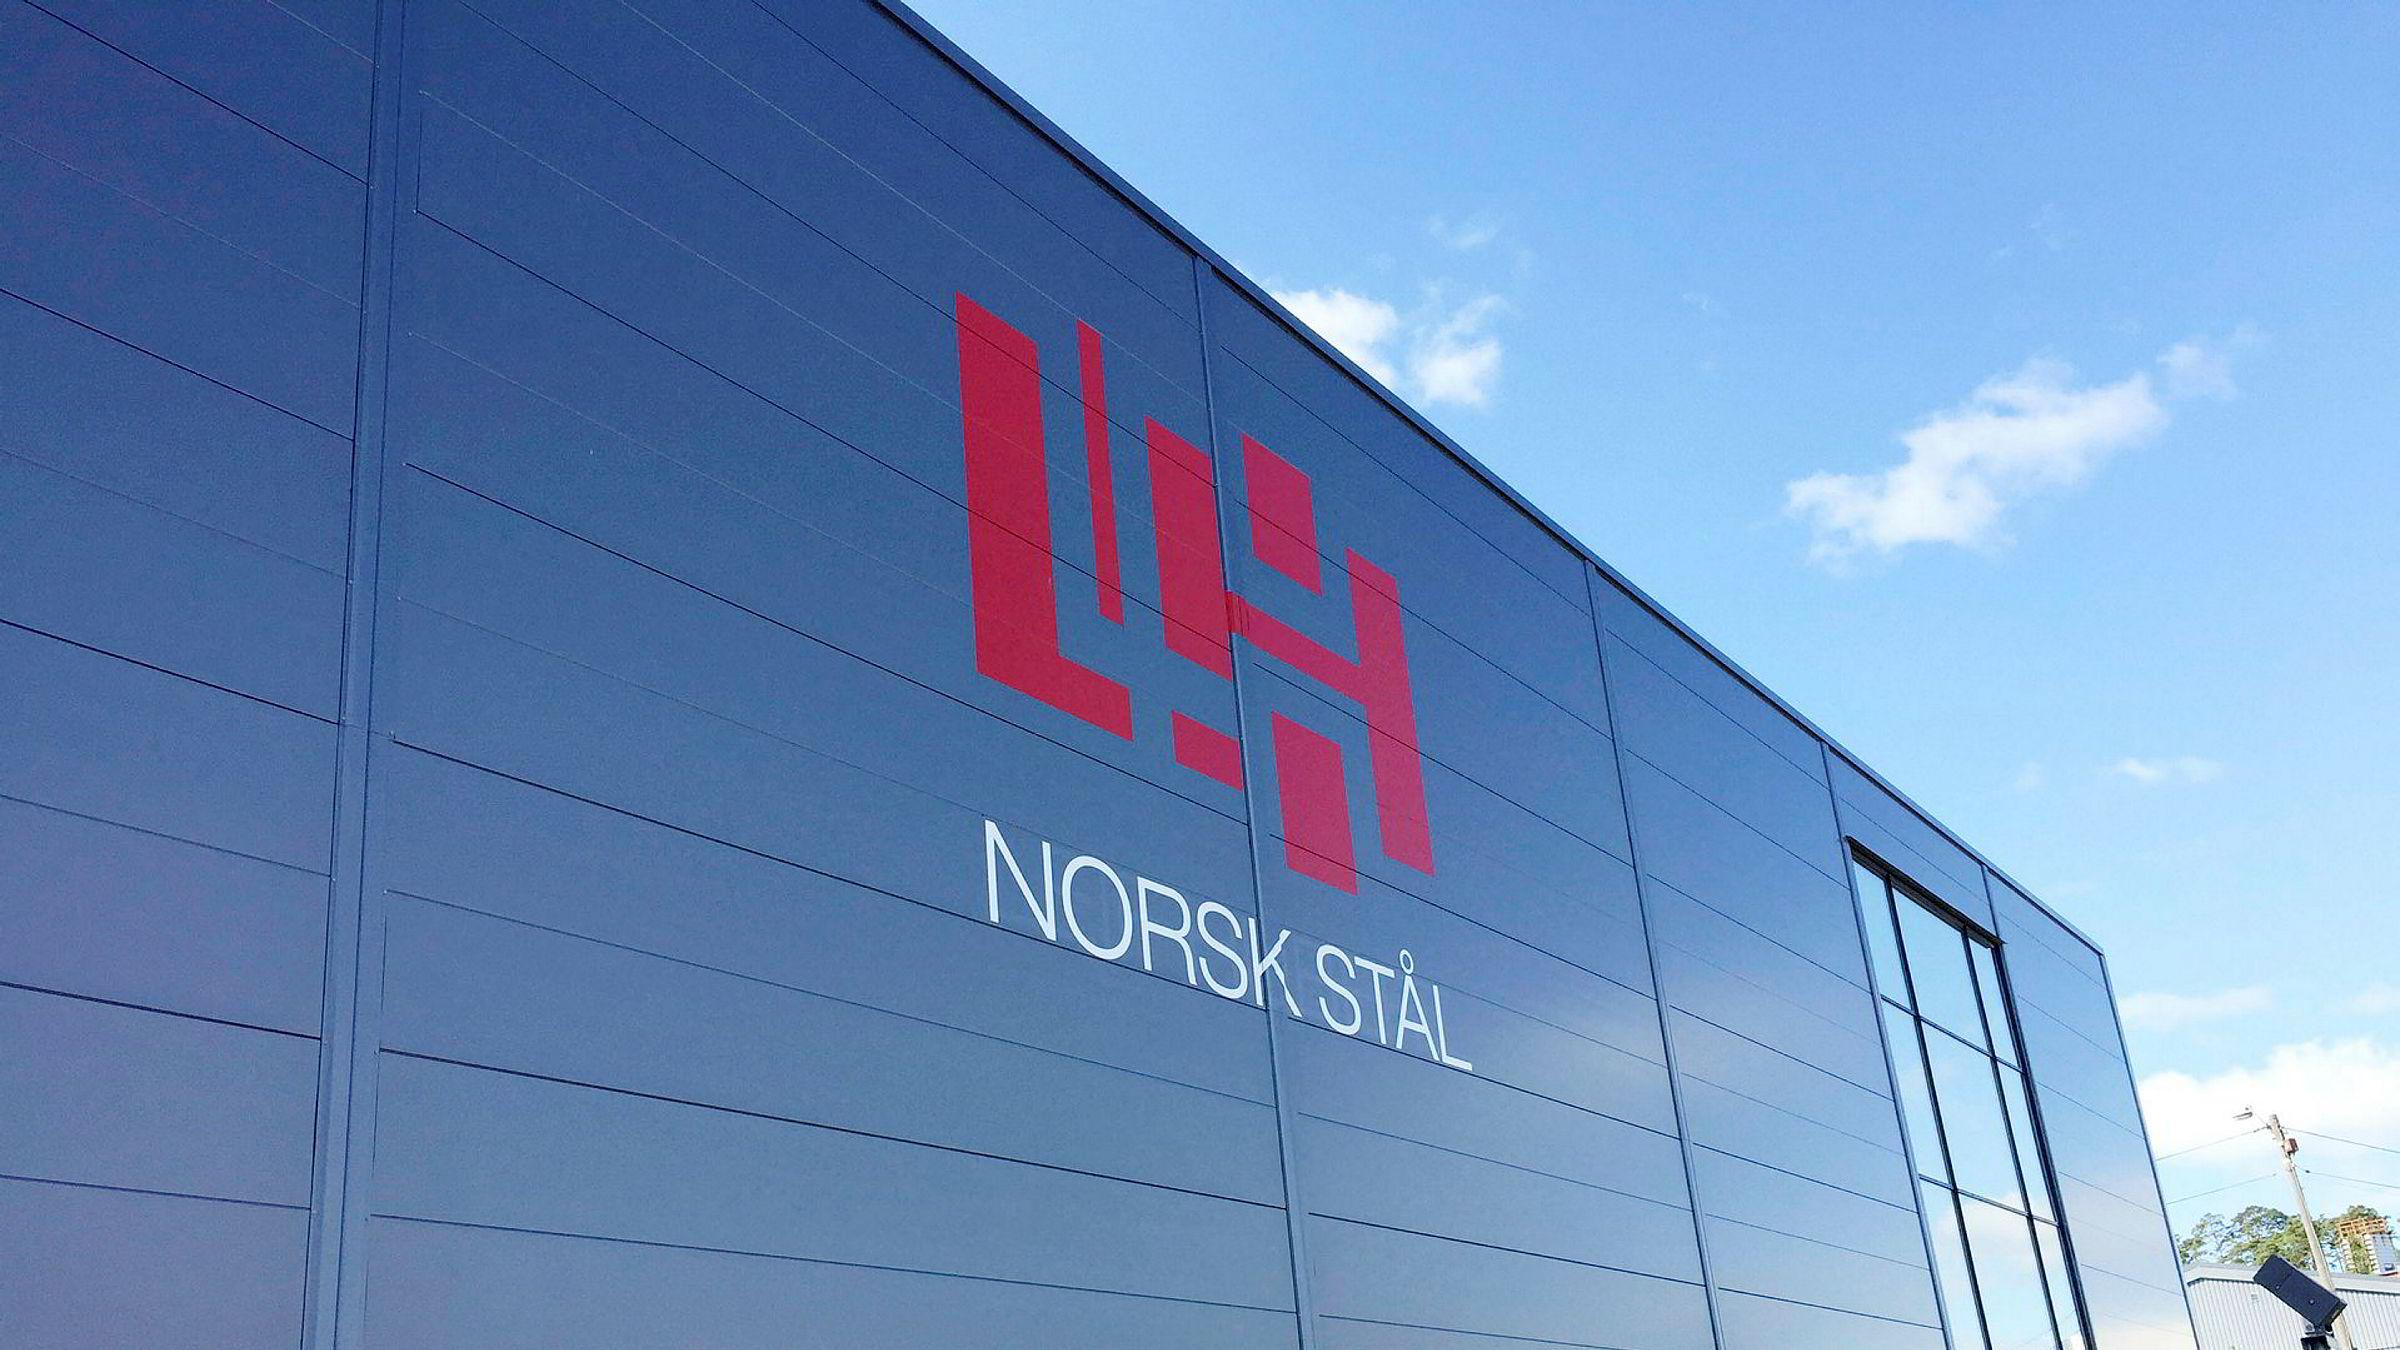 Den anonyme Søgne-milliardæren Leif Hübert eier blant annet Norges største stålgrossist, Norsk Stål. Men det er ikke det han tjener mest penger på.